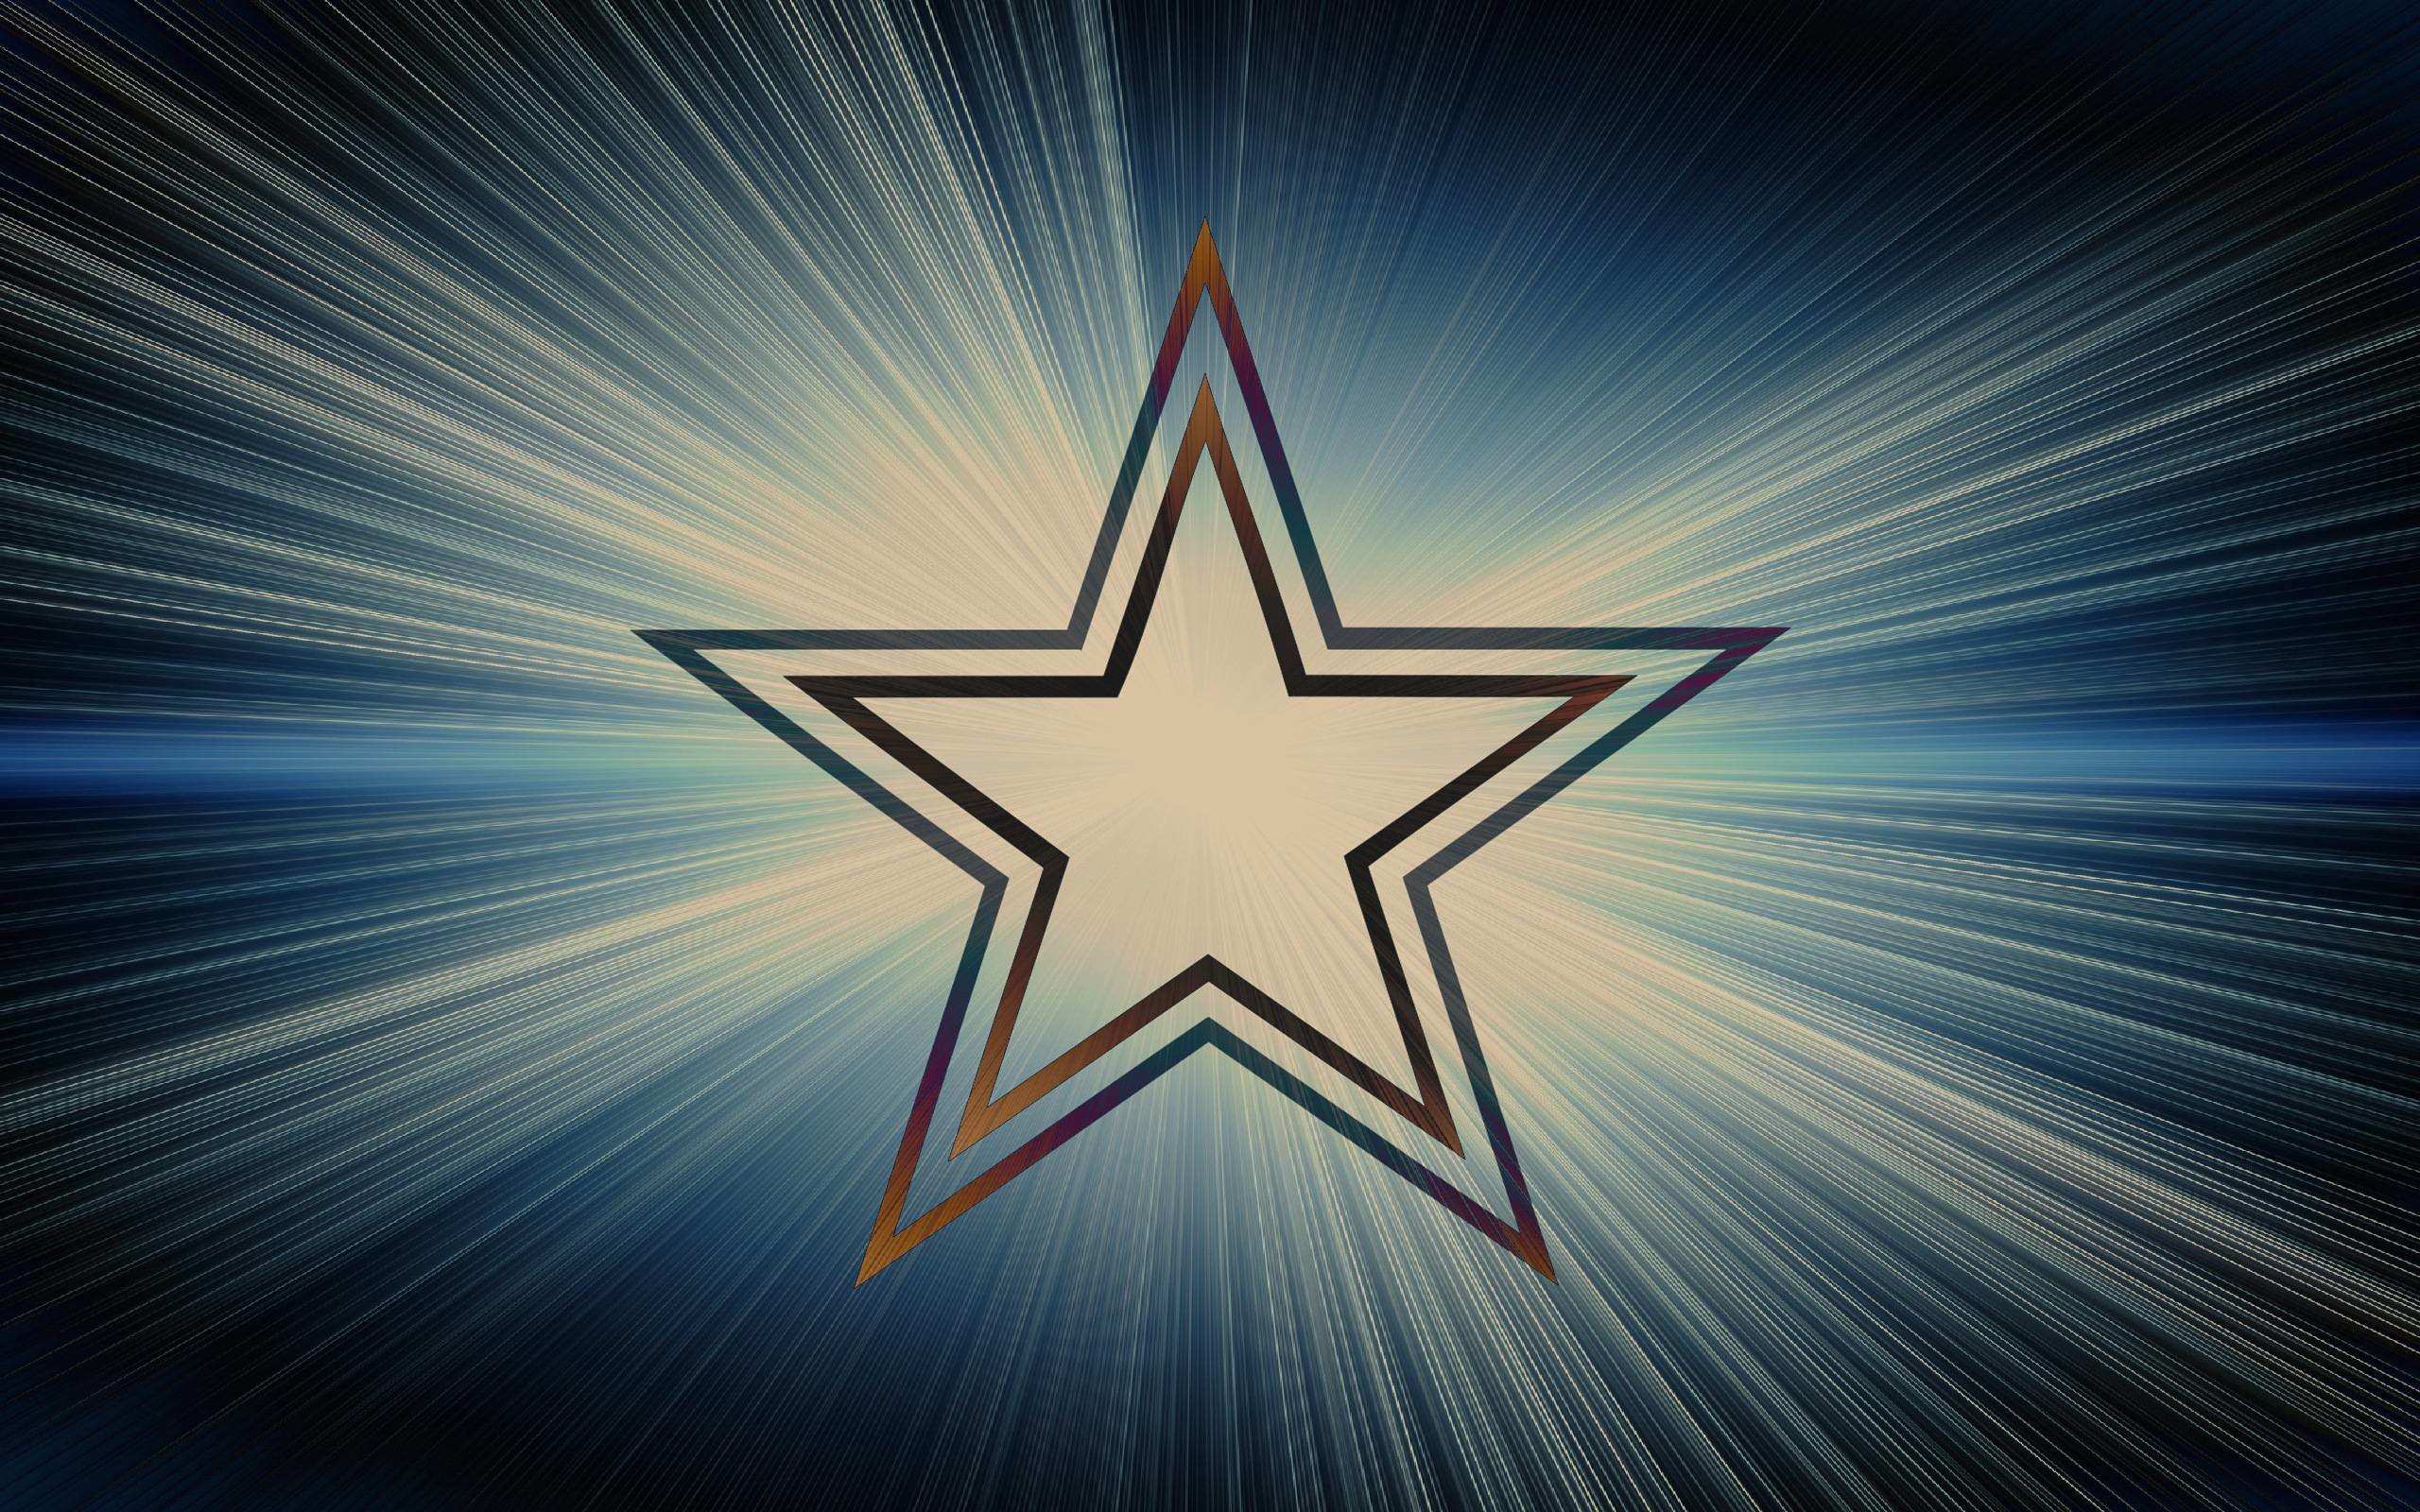 12 Dallas Cowboys Wallpapers | Dallas Cowboys Backgrounds